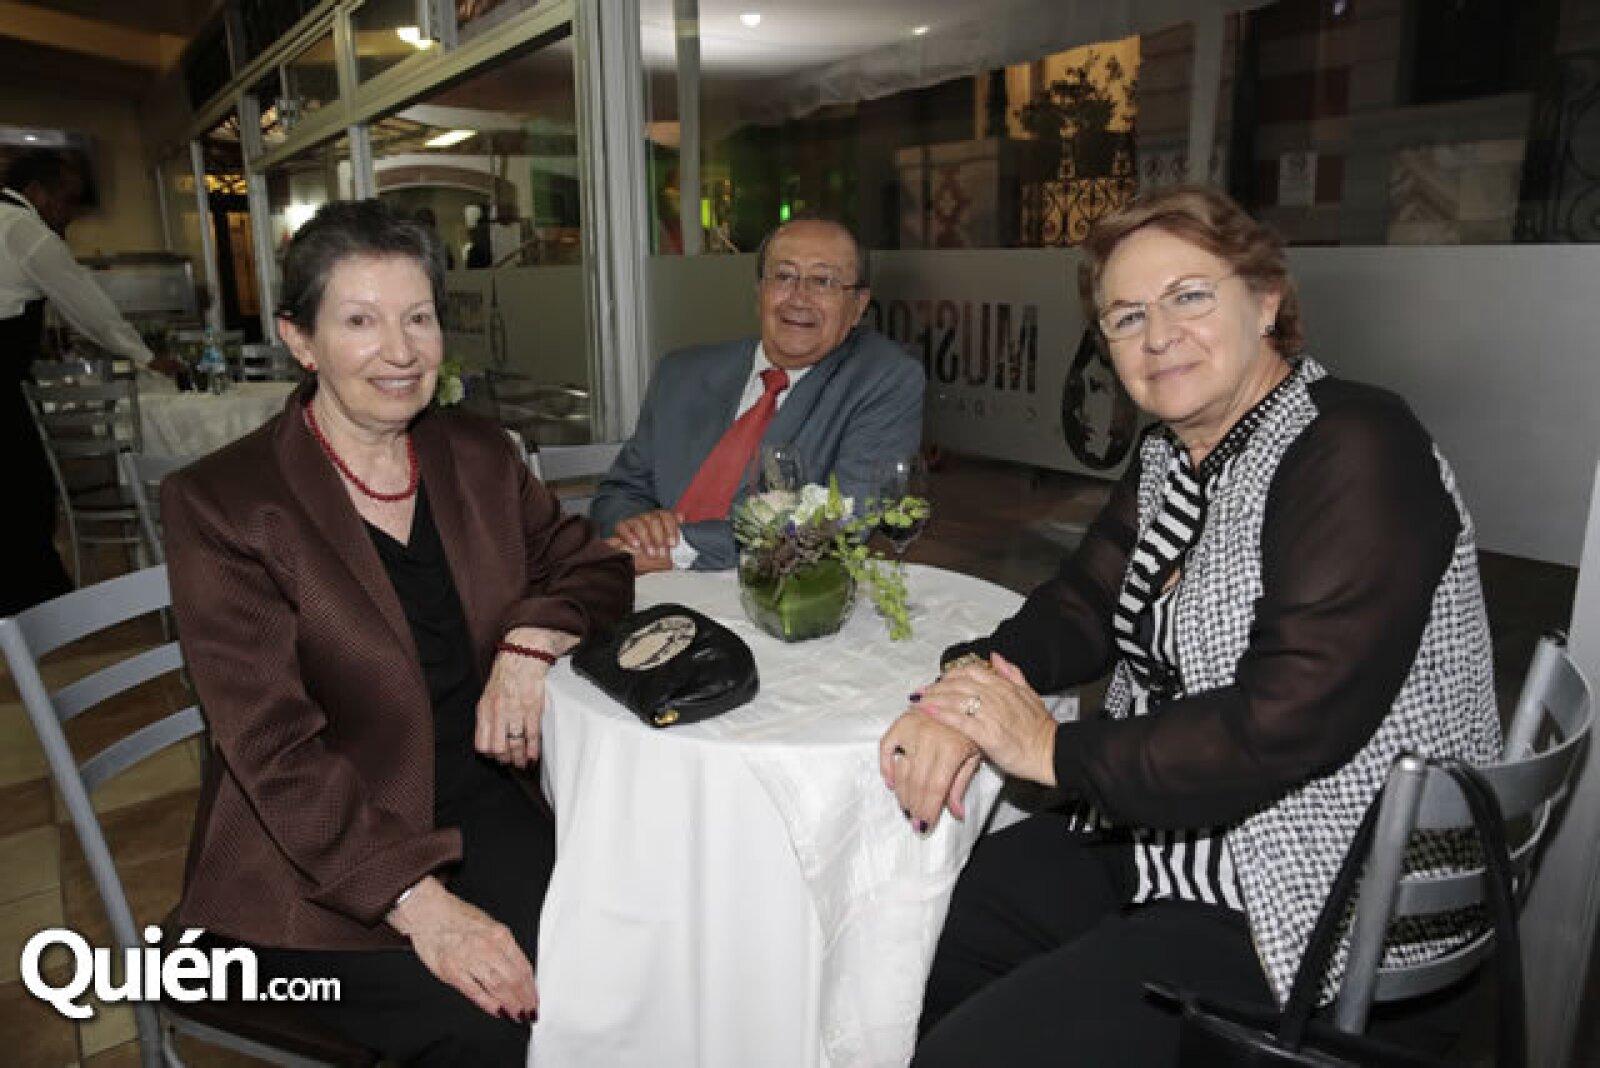 Michelle Rabner,Alejandro Rendón,Berta de Rendón